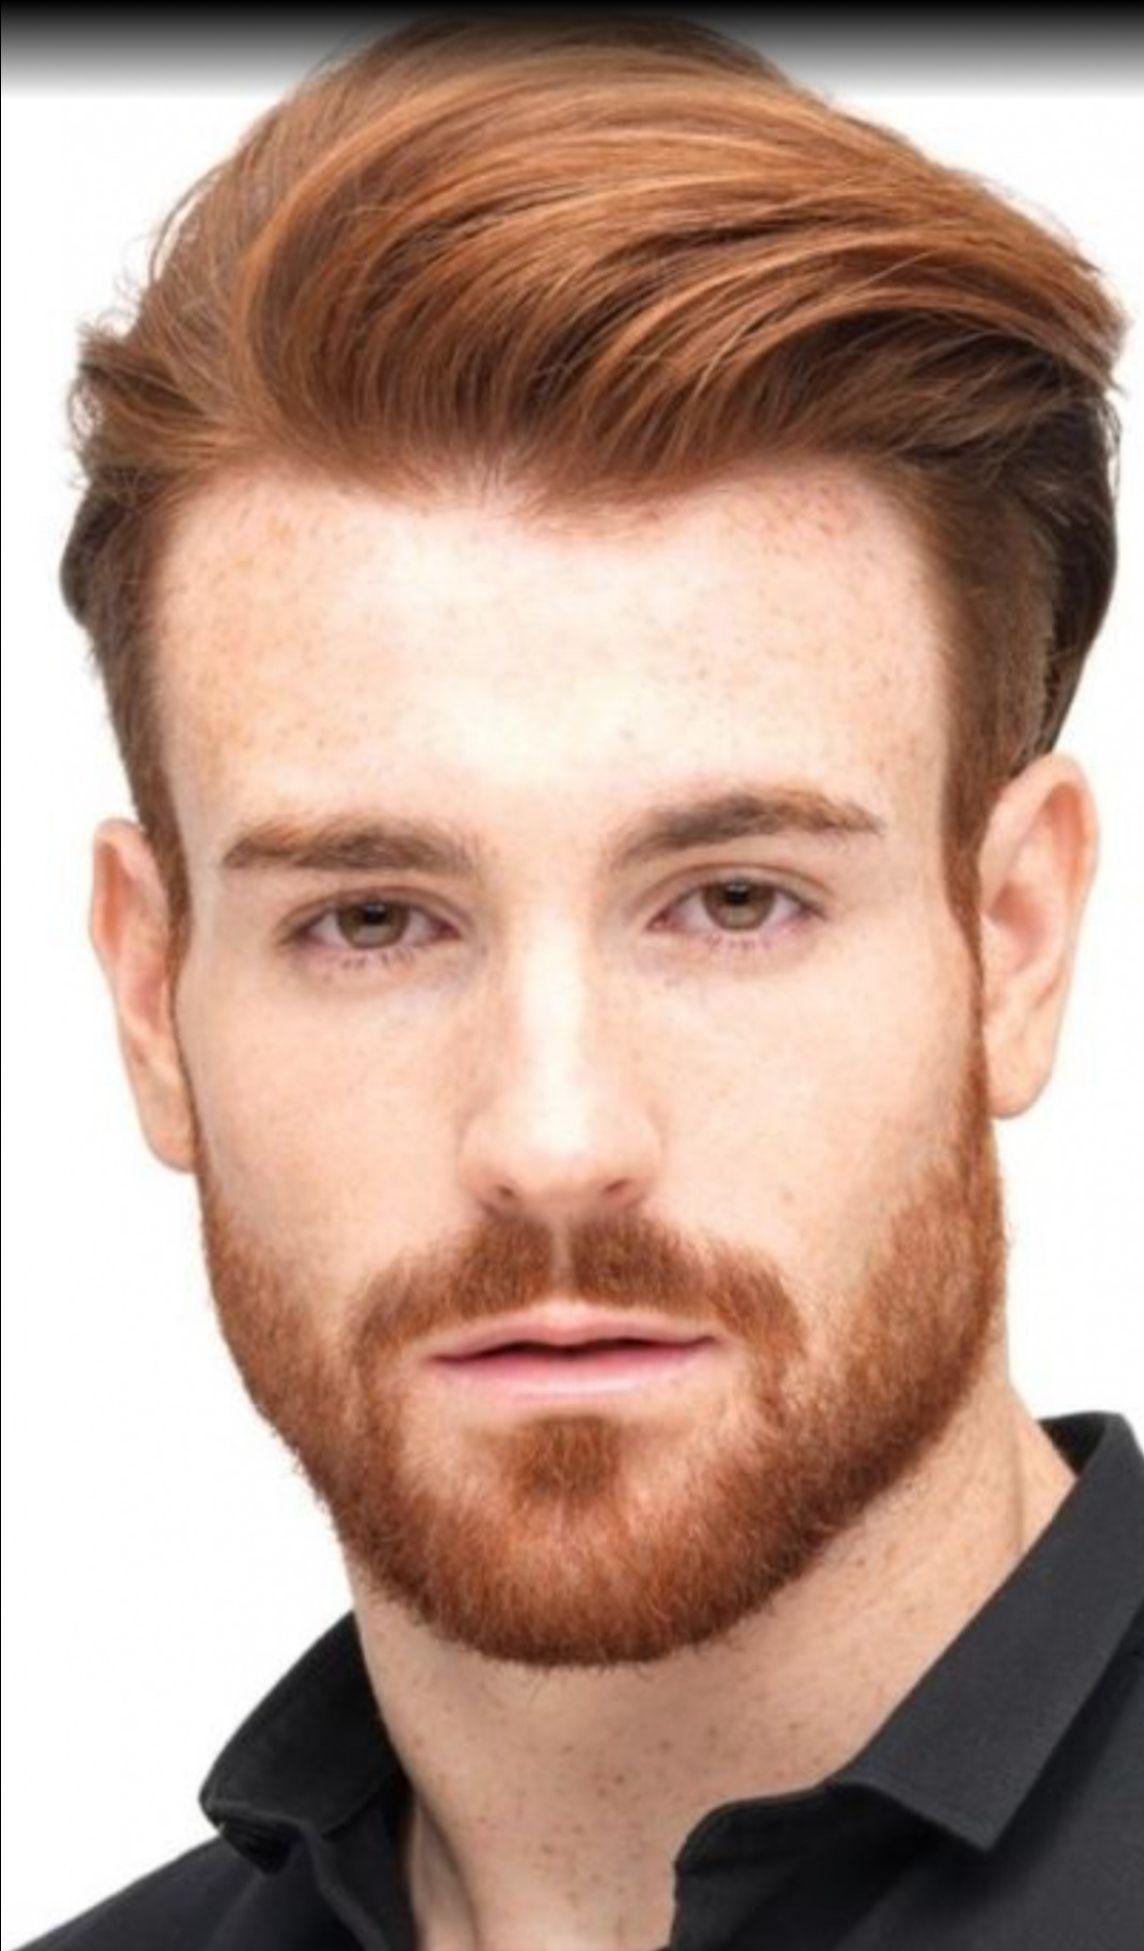 Topmenshaircuts Red Hair Men Long Hair Styles Men Cool Hairstyles For Men